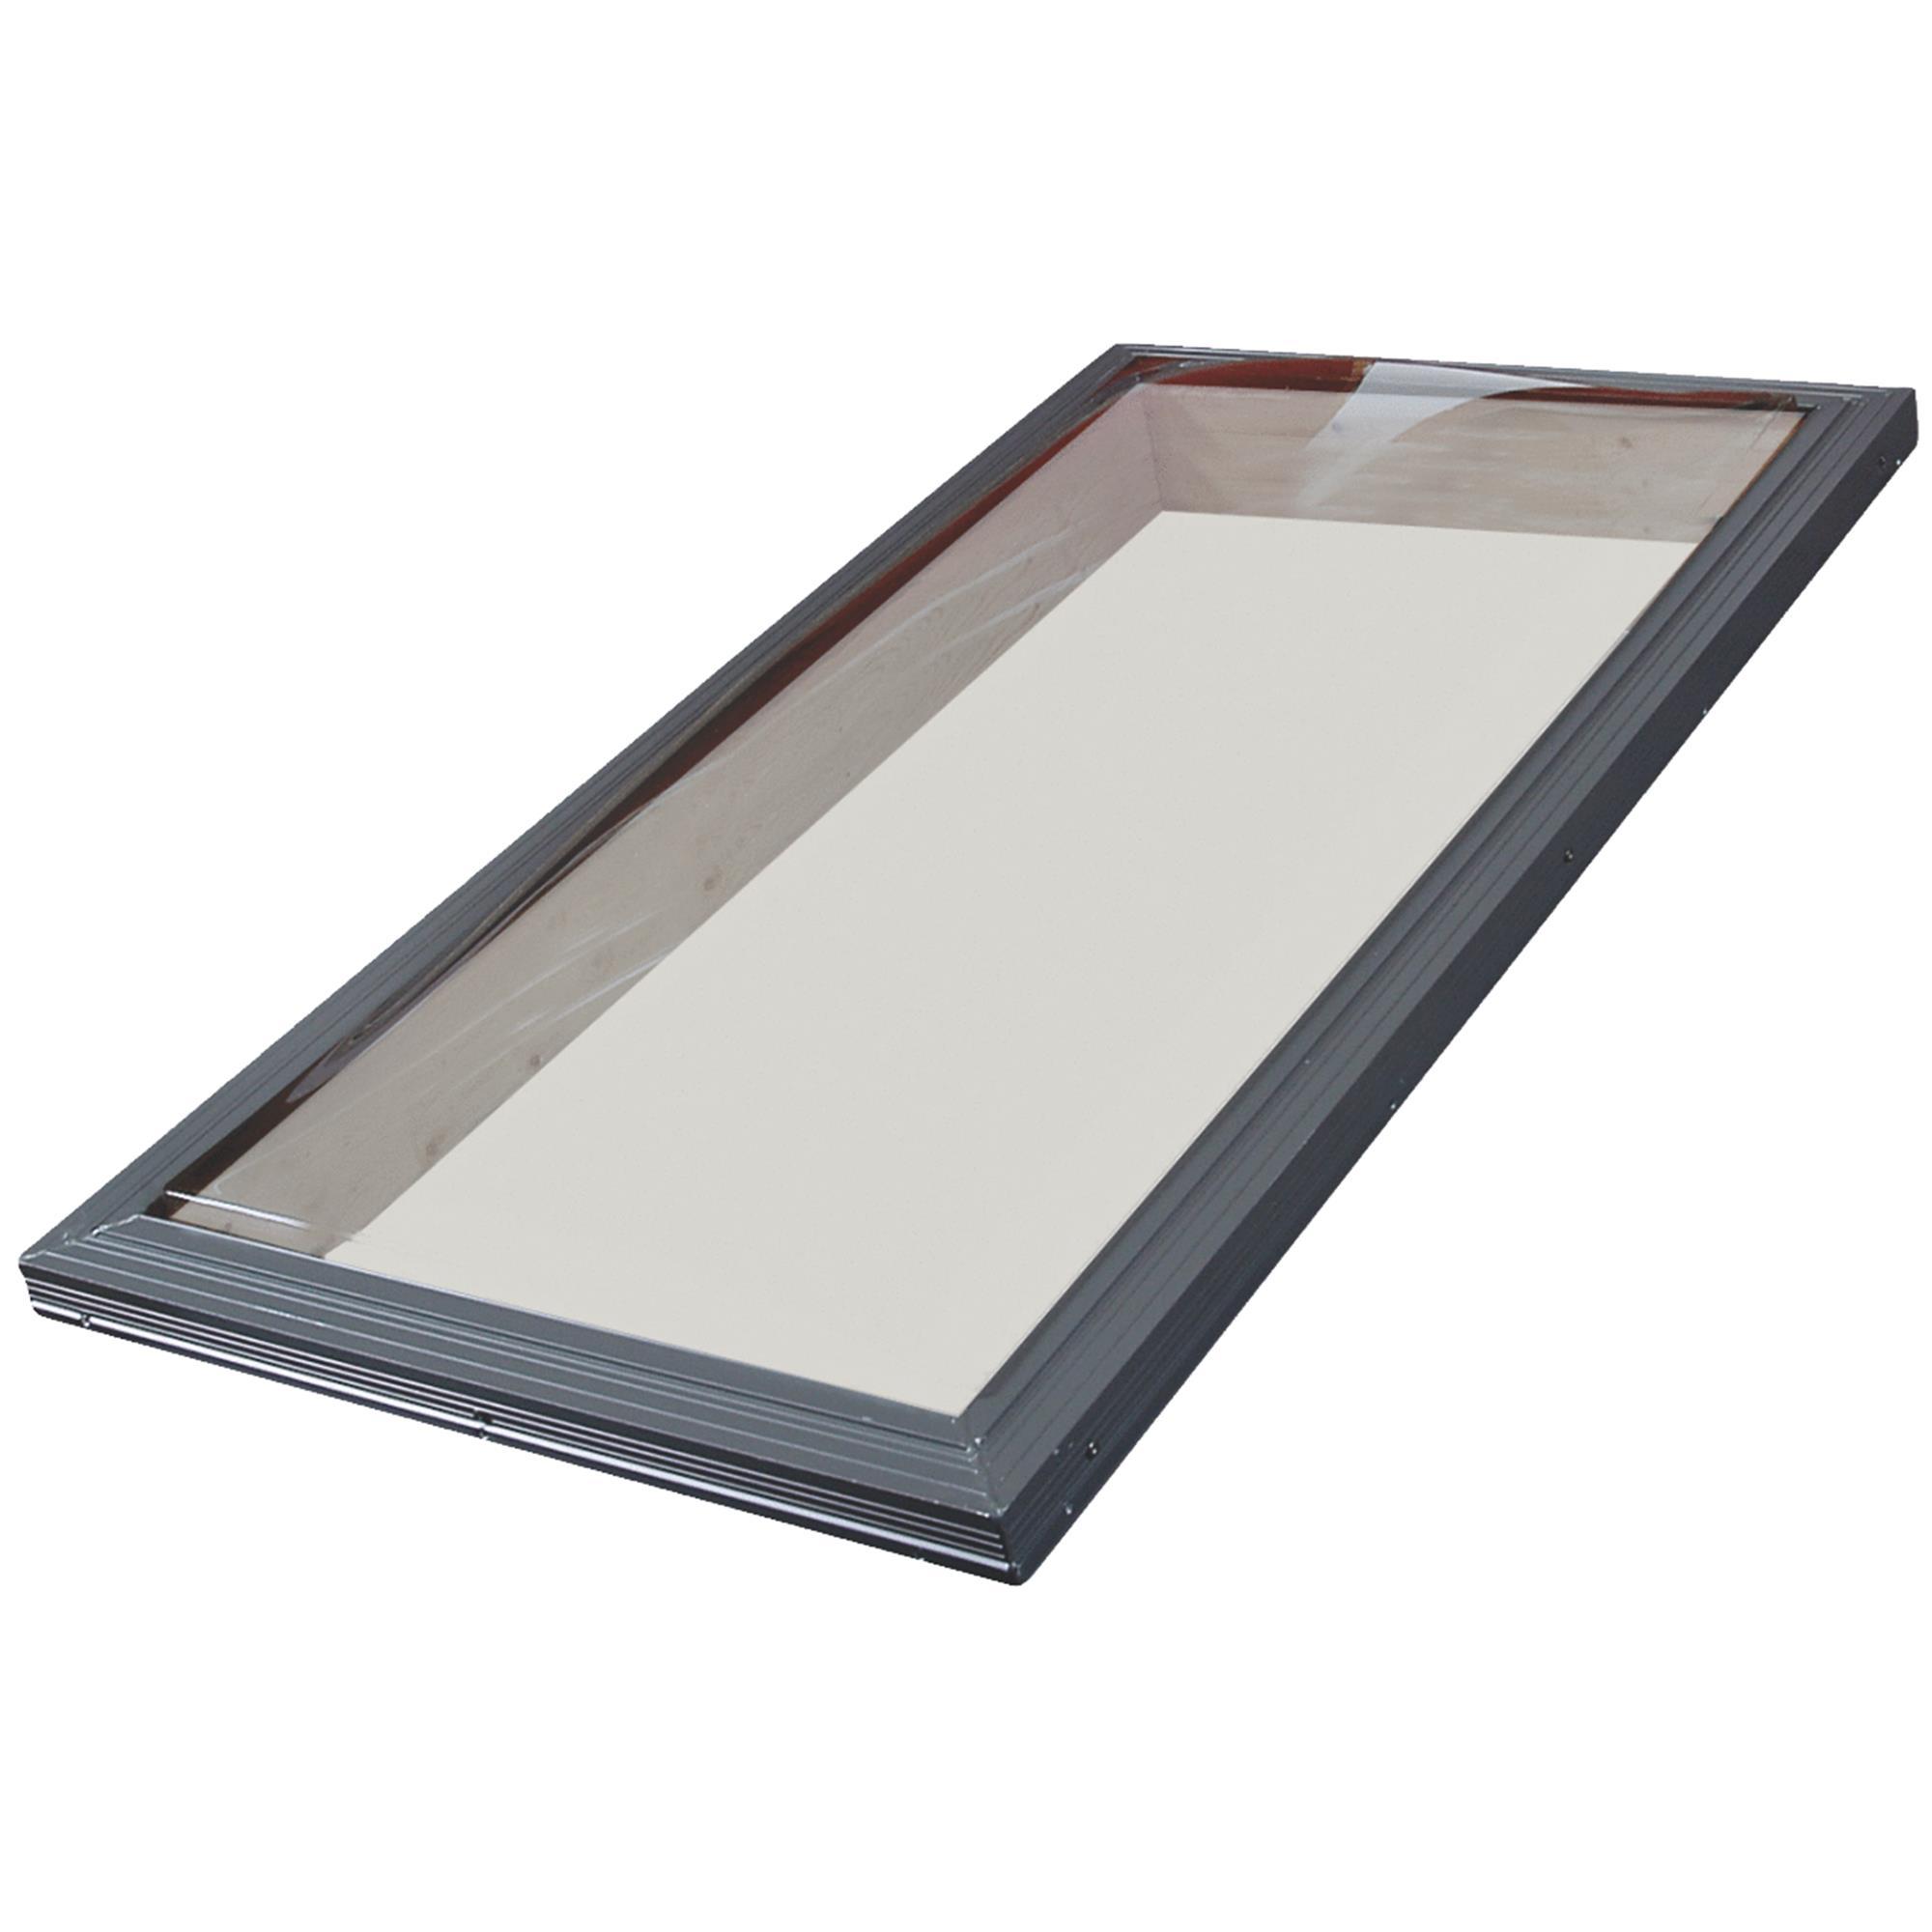 Sun-Tek Curb Mount Aluminum Frame Skylight